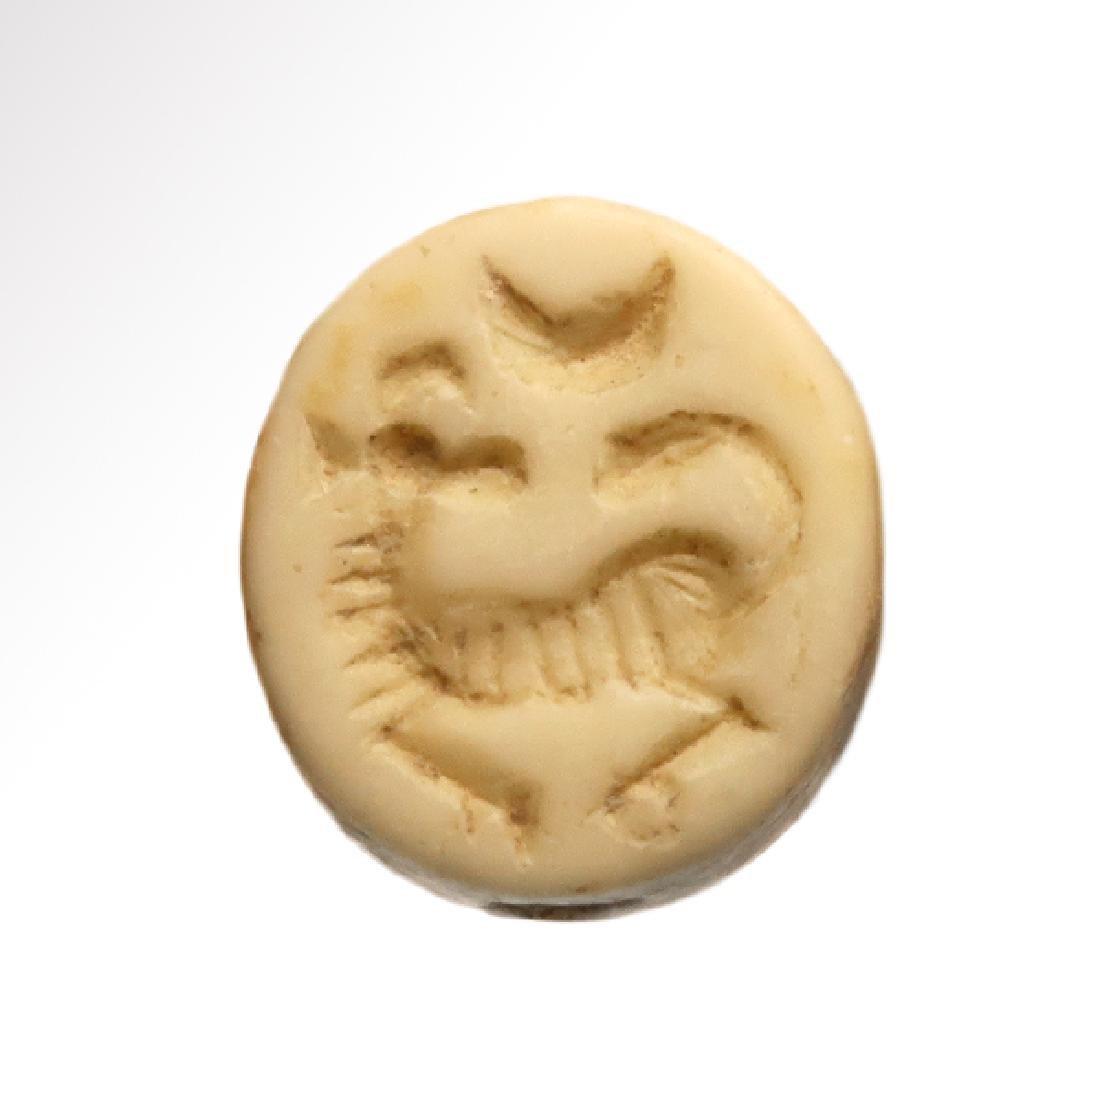 Phoenician Yellow Steatite Seal with Ram, c. 600-500